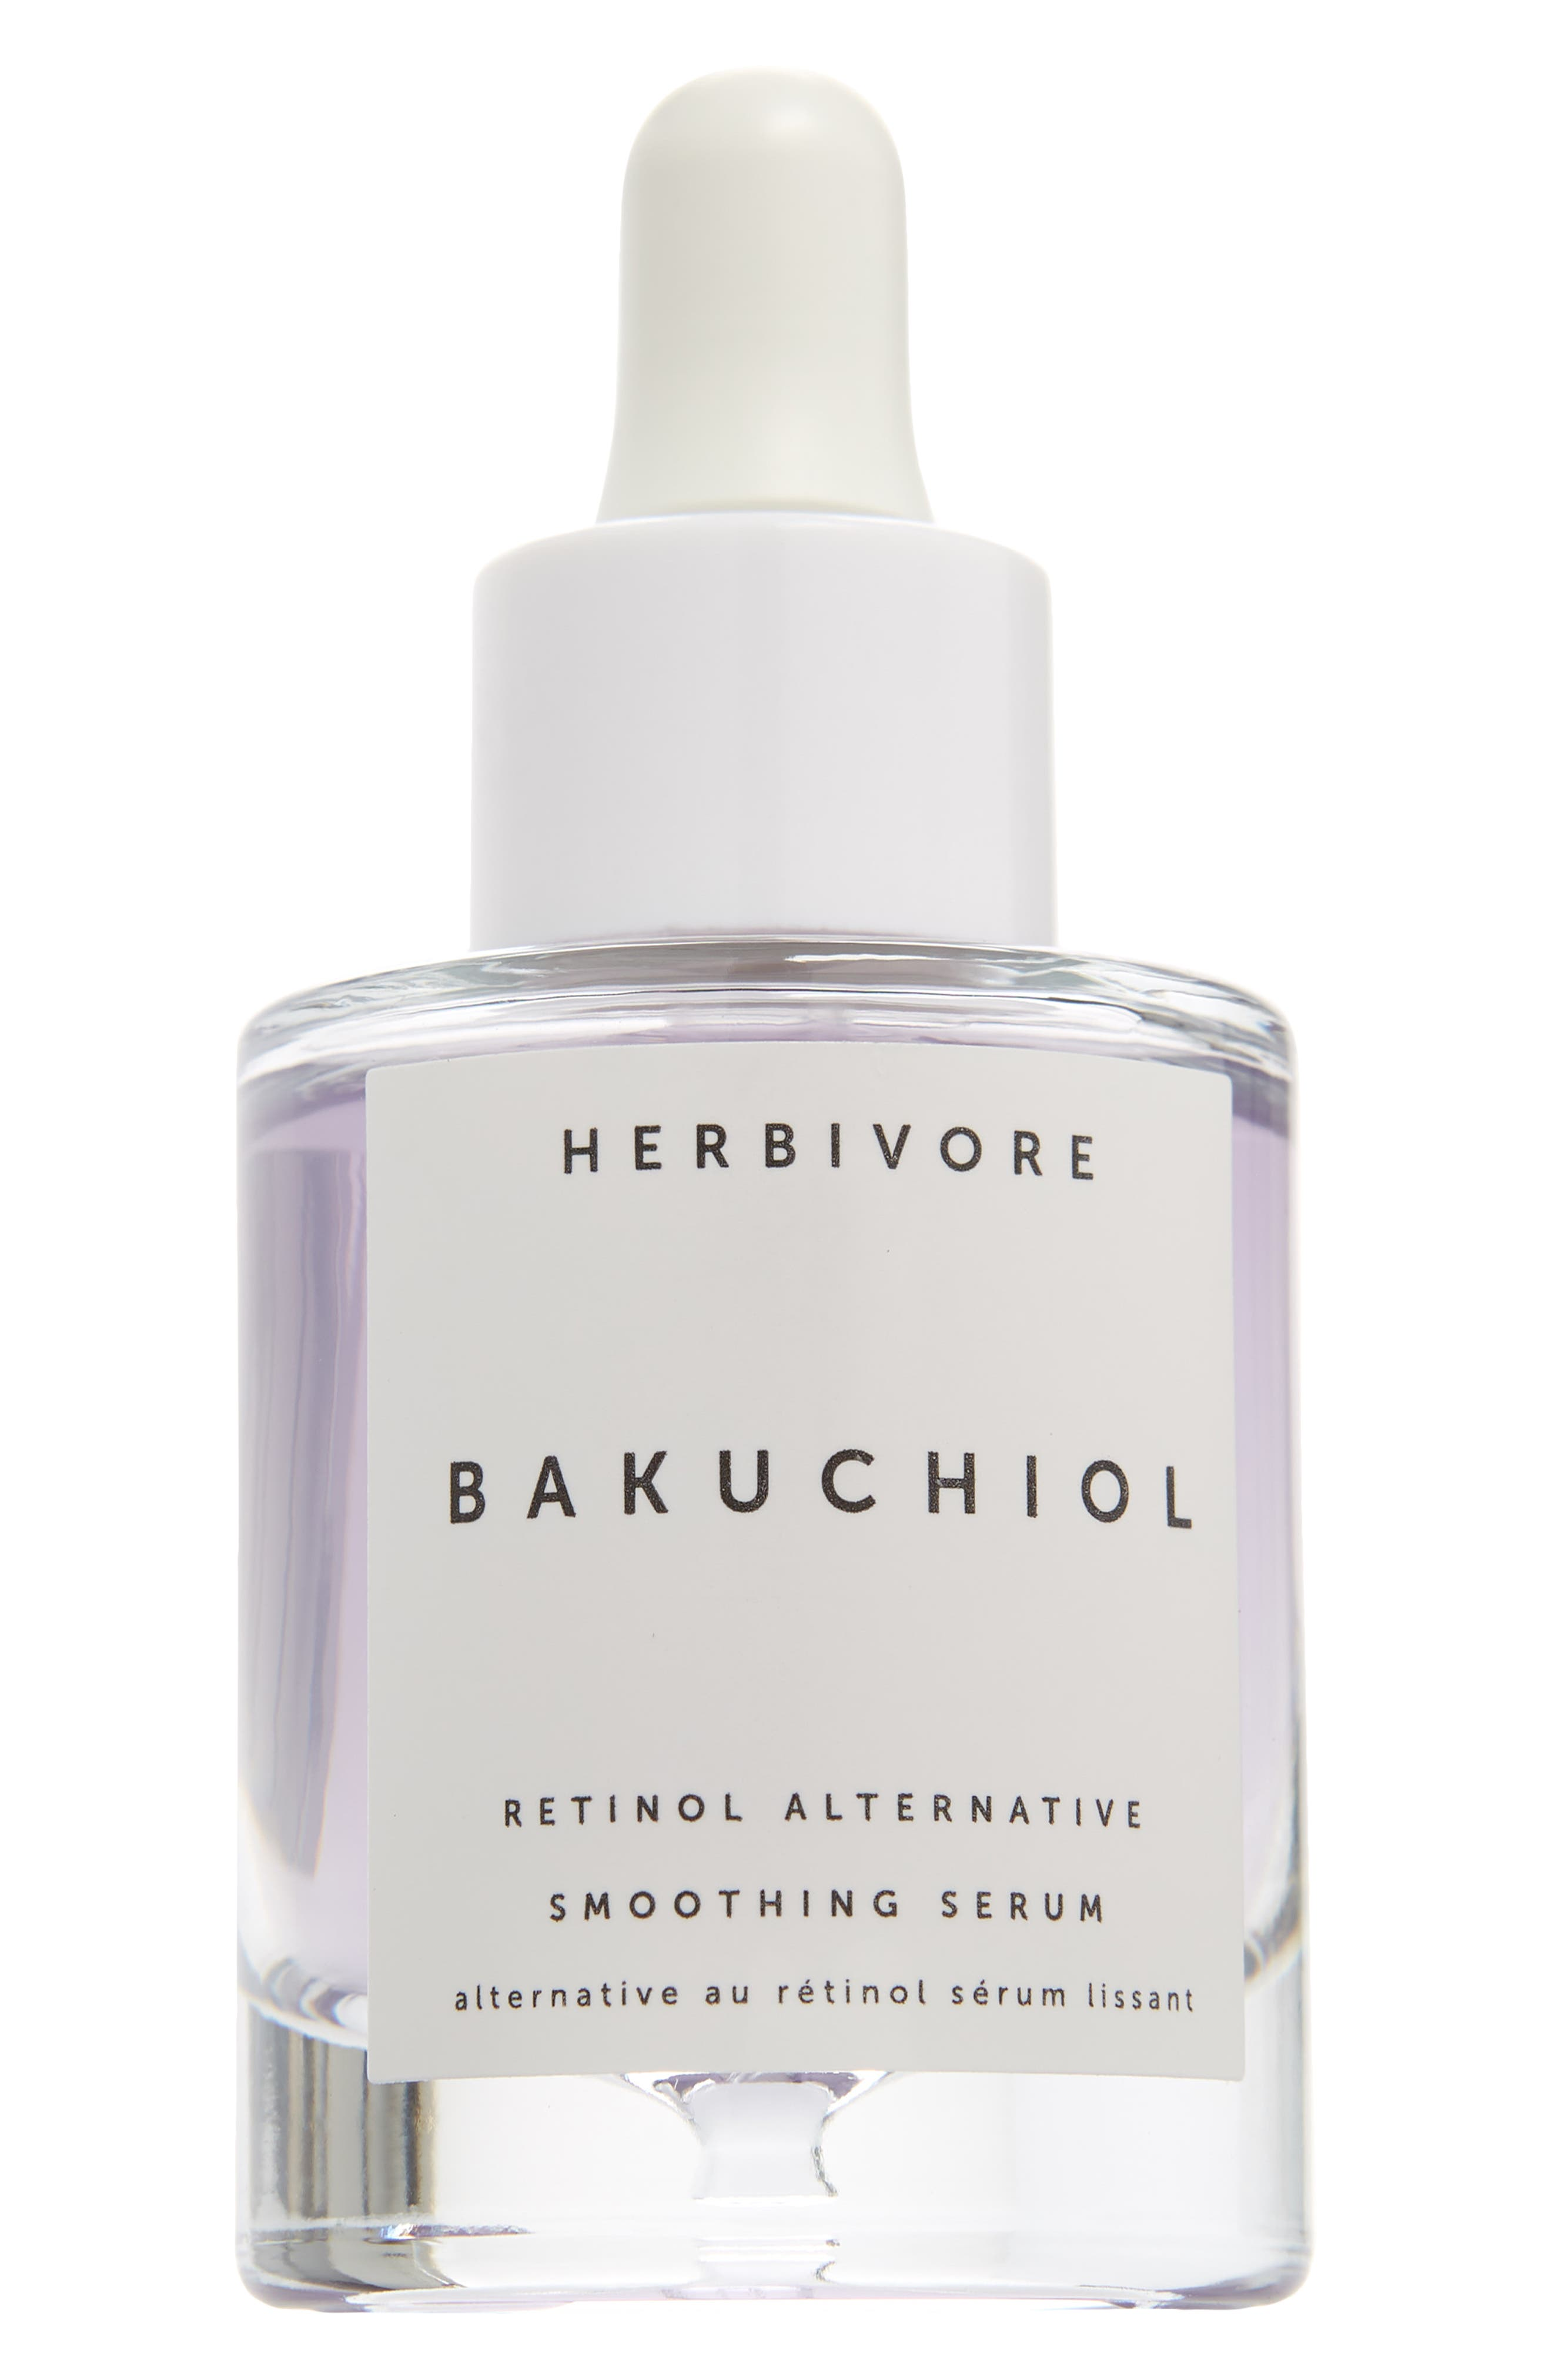 Bakuchiol Retinol Alternative Smoothing Serum